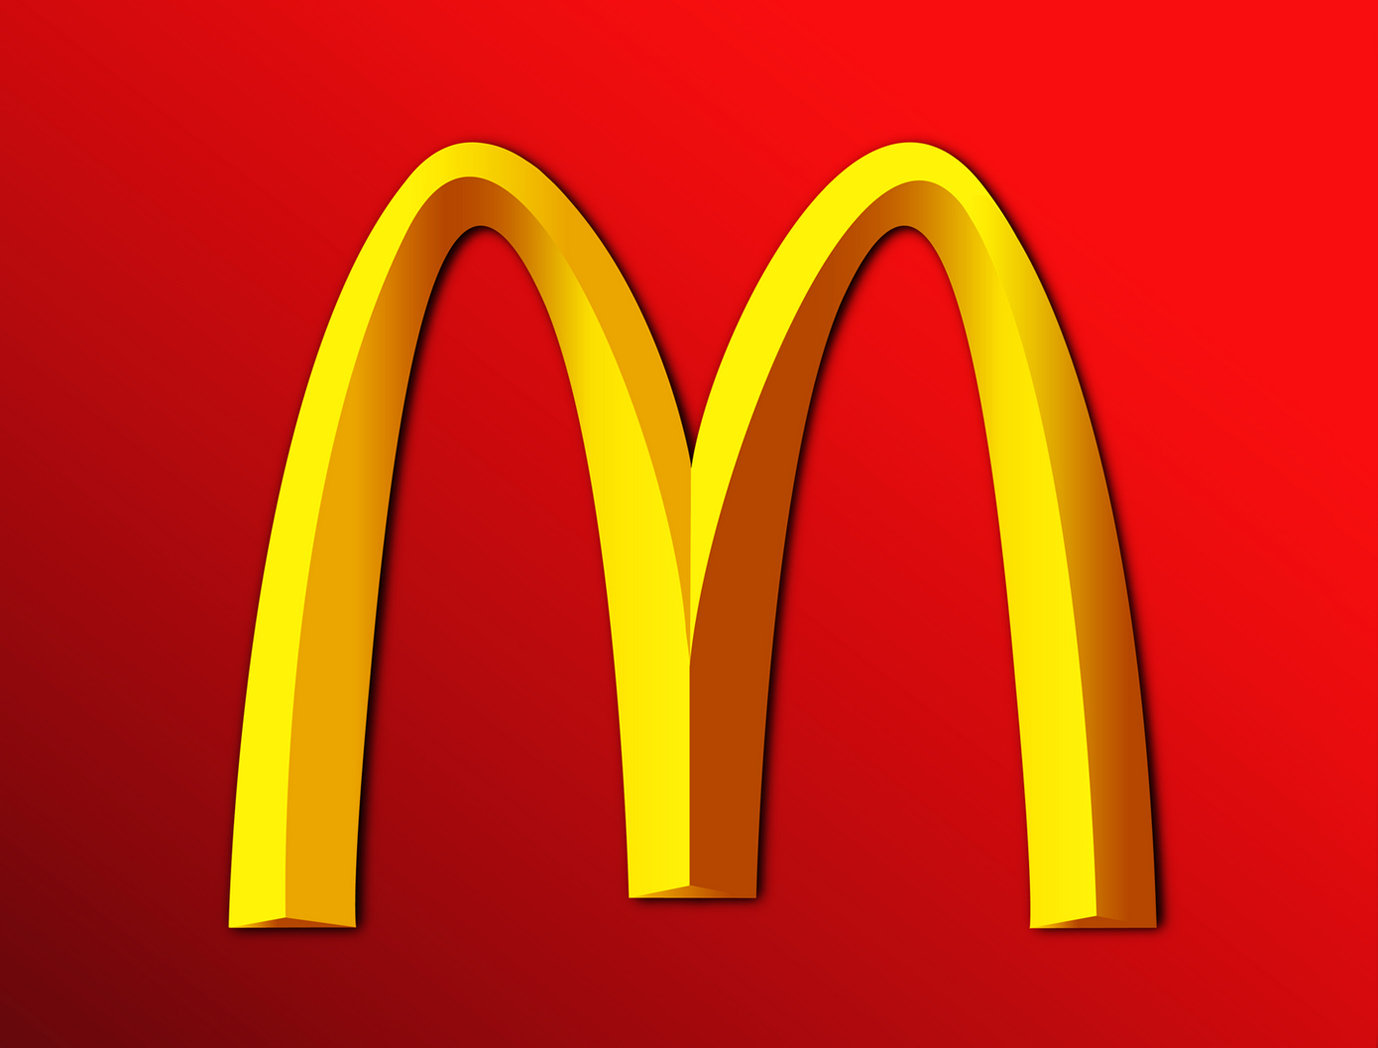 McDonald's se une a Ferro con un fin solidario